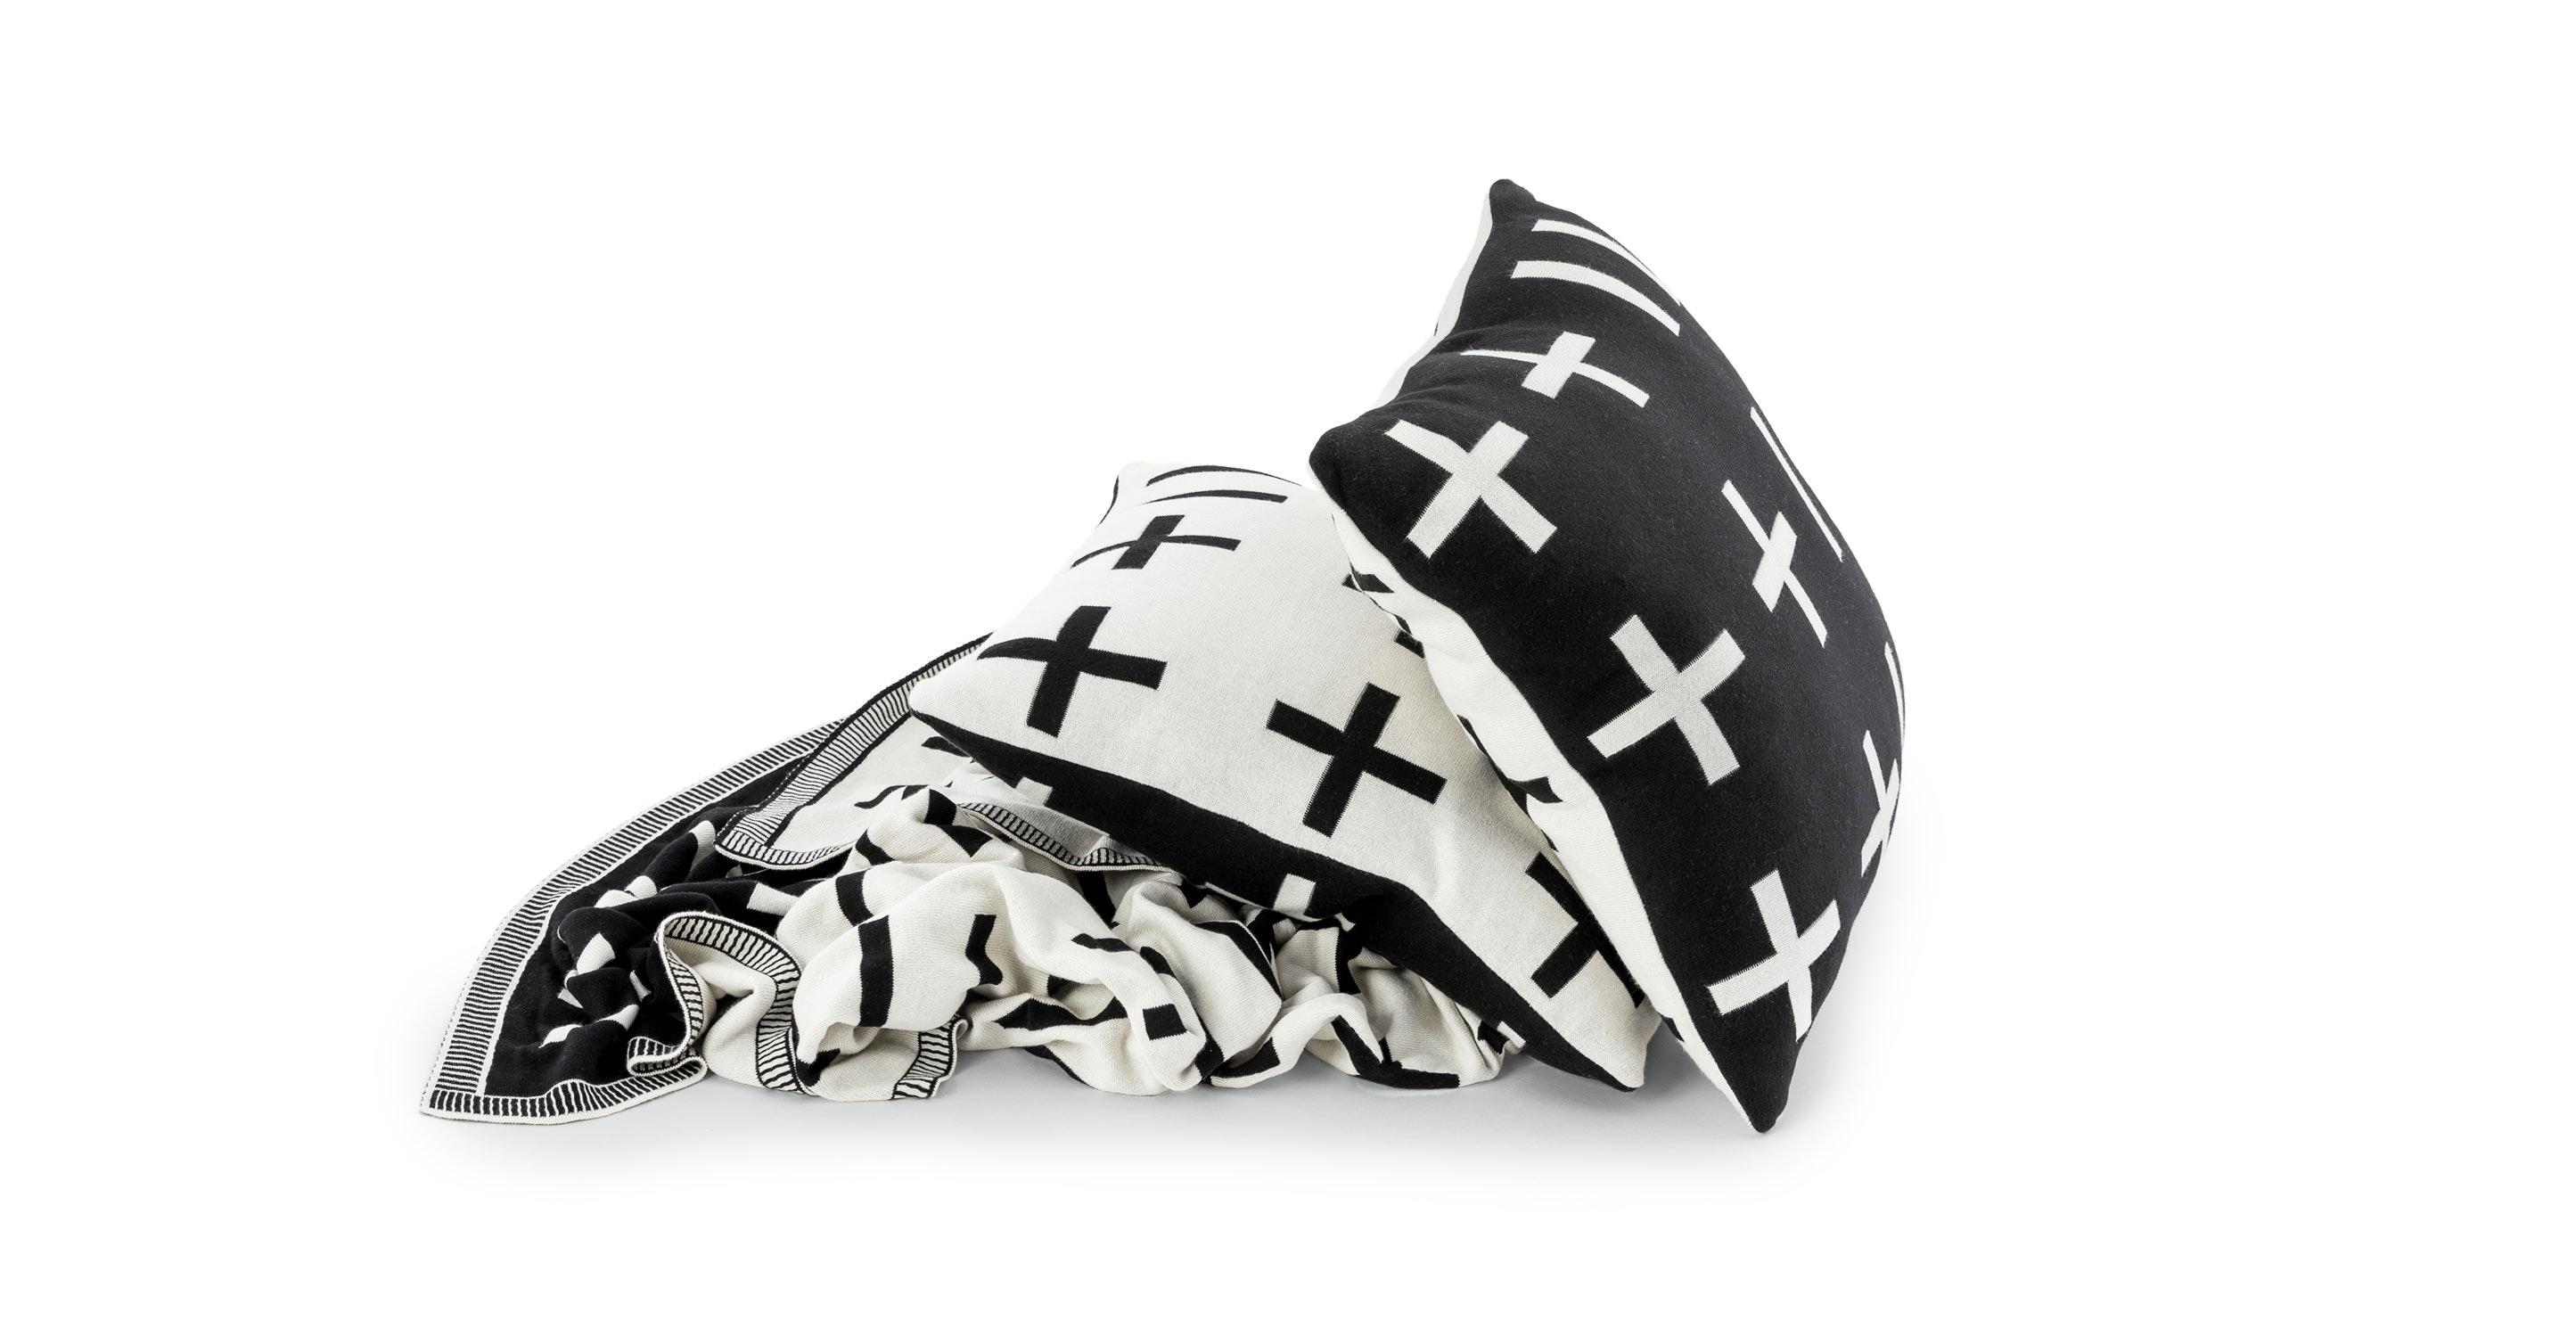 Black And White Throw Pillow Set : Tempe Black / White Throw and Pillow Set - Pillows - Article Modern, Mid-Century and ...